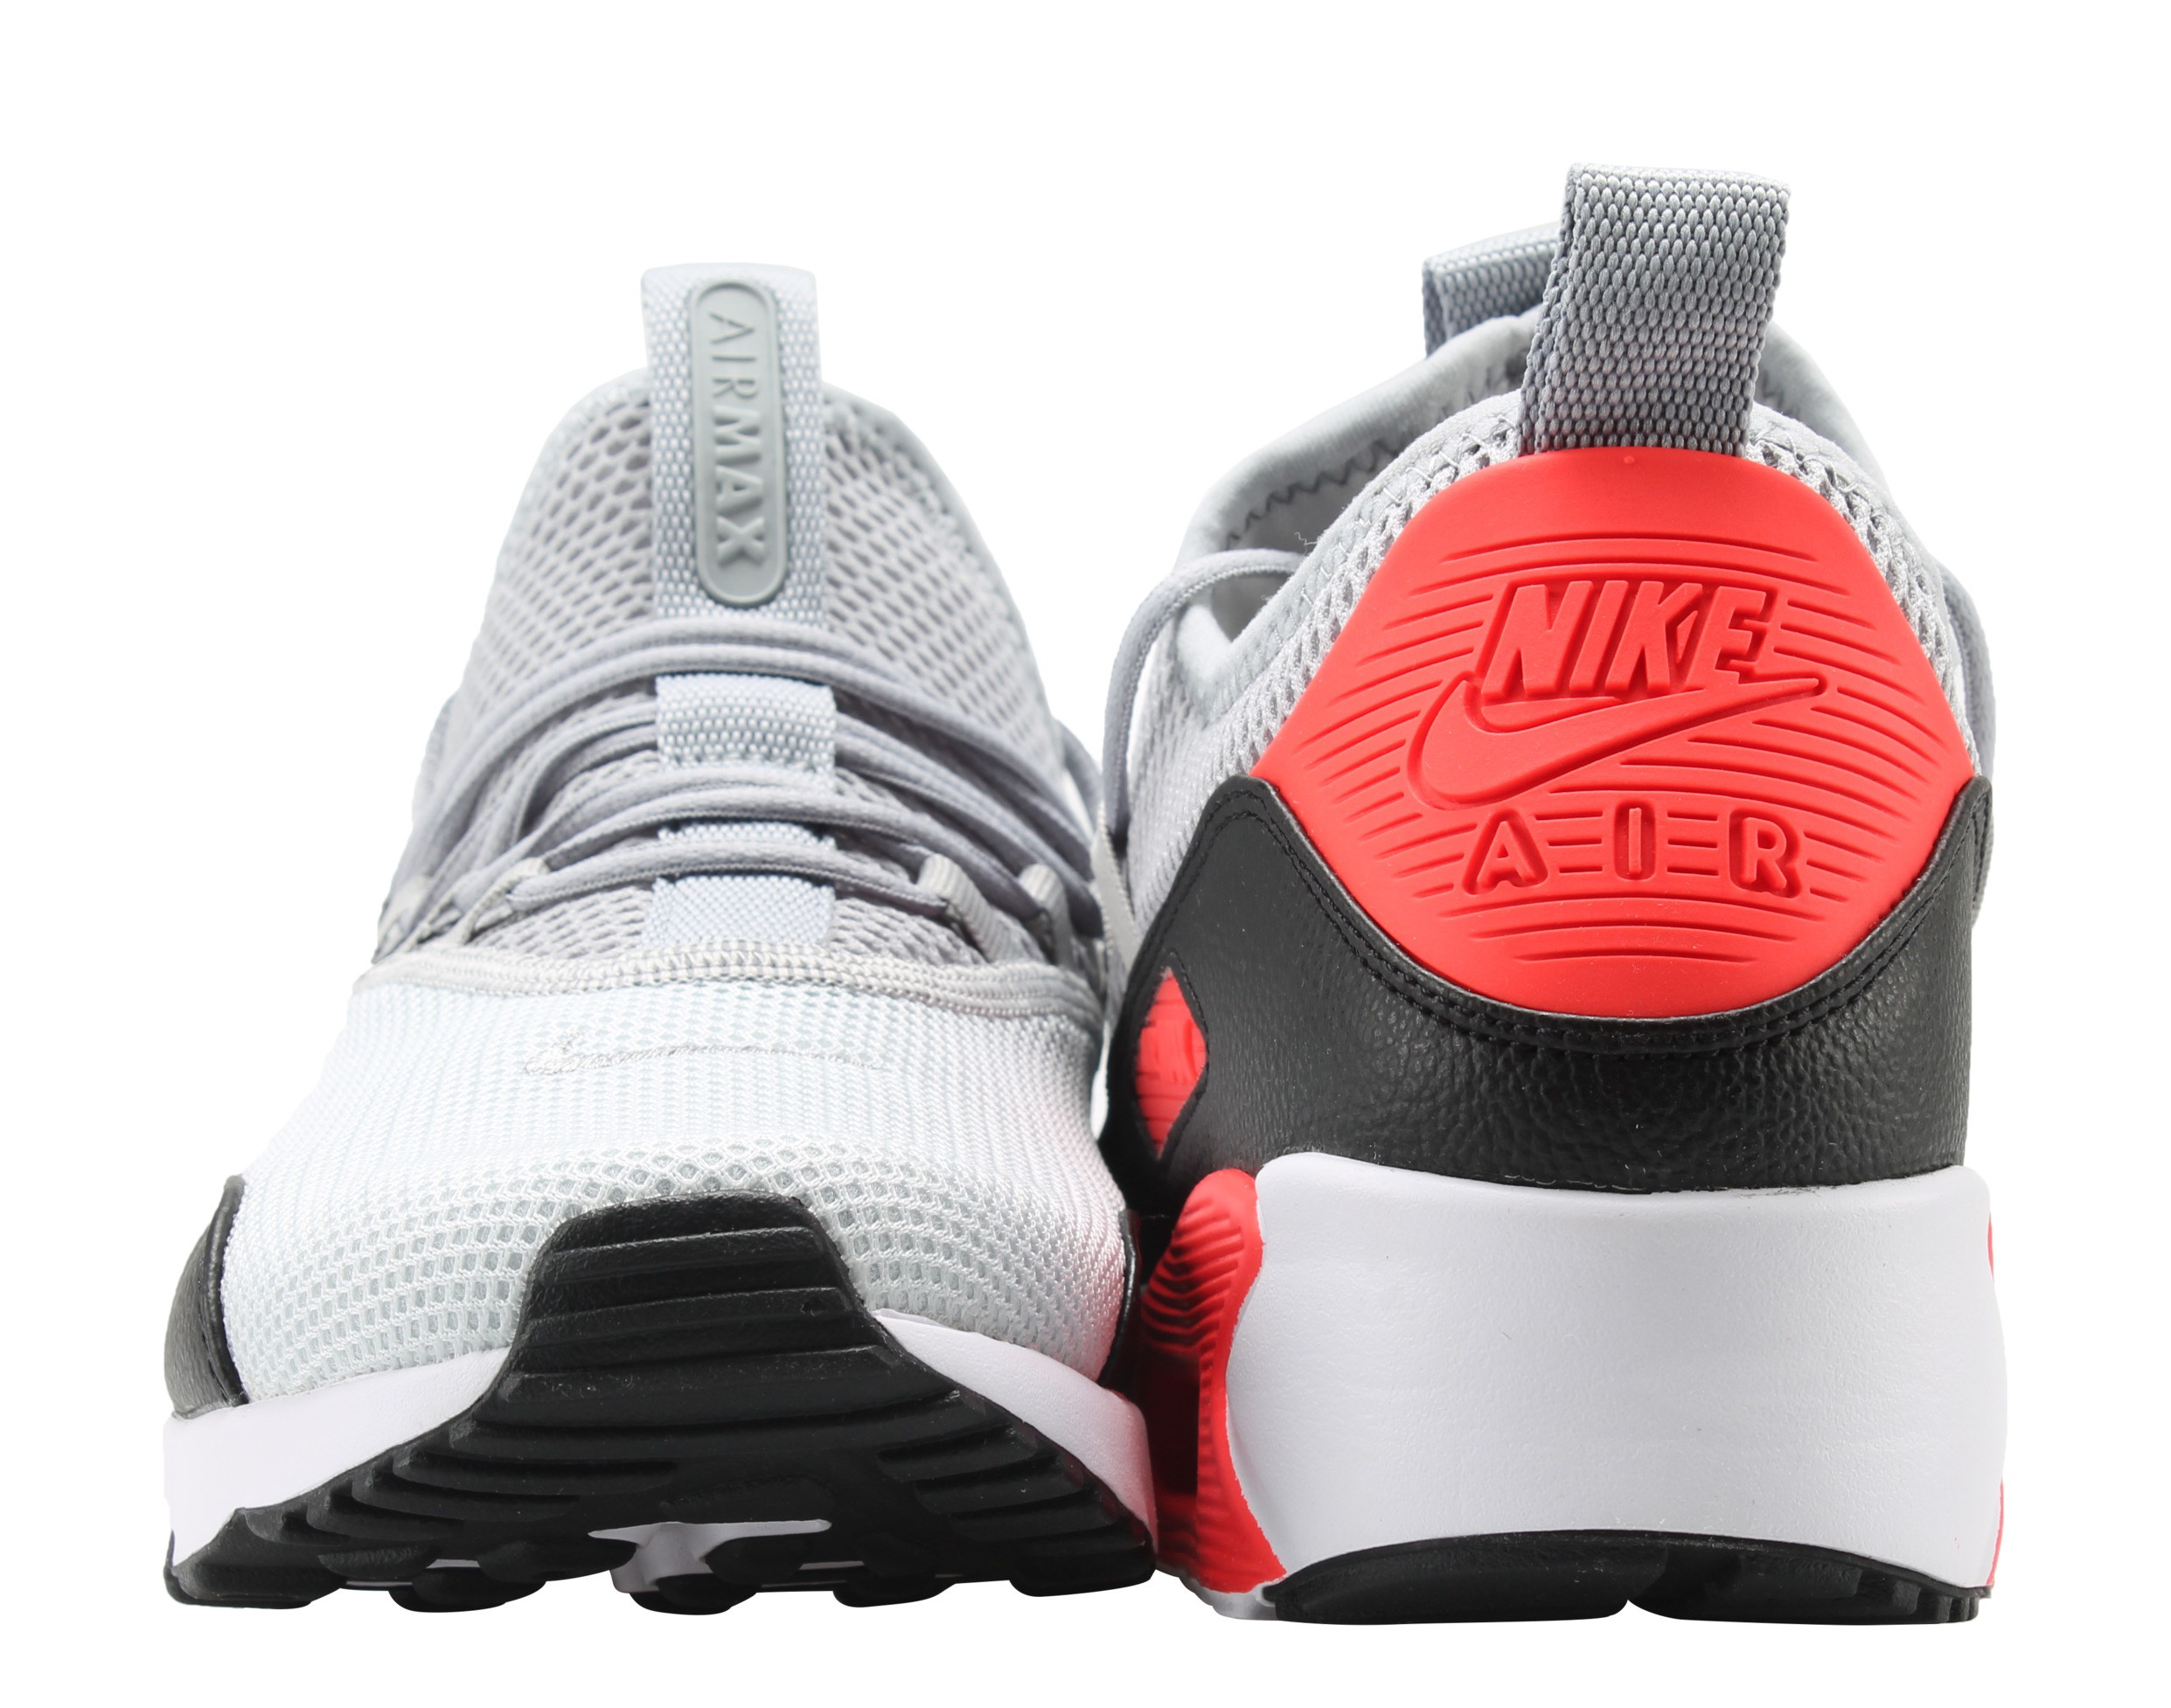 sports shoes 42b6f cdc58 Nike - Nike Air Max 90 EZ Grey Infrared-Black Men s Running Shoes AO1745-002  - Walmart.com